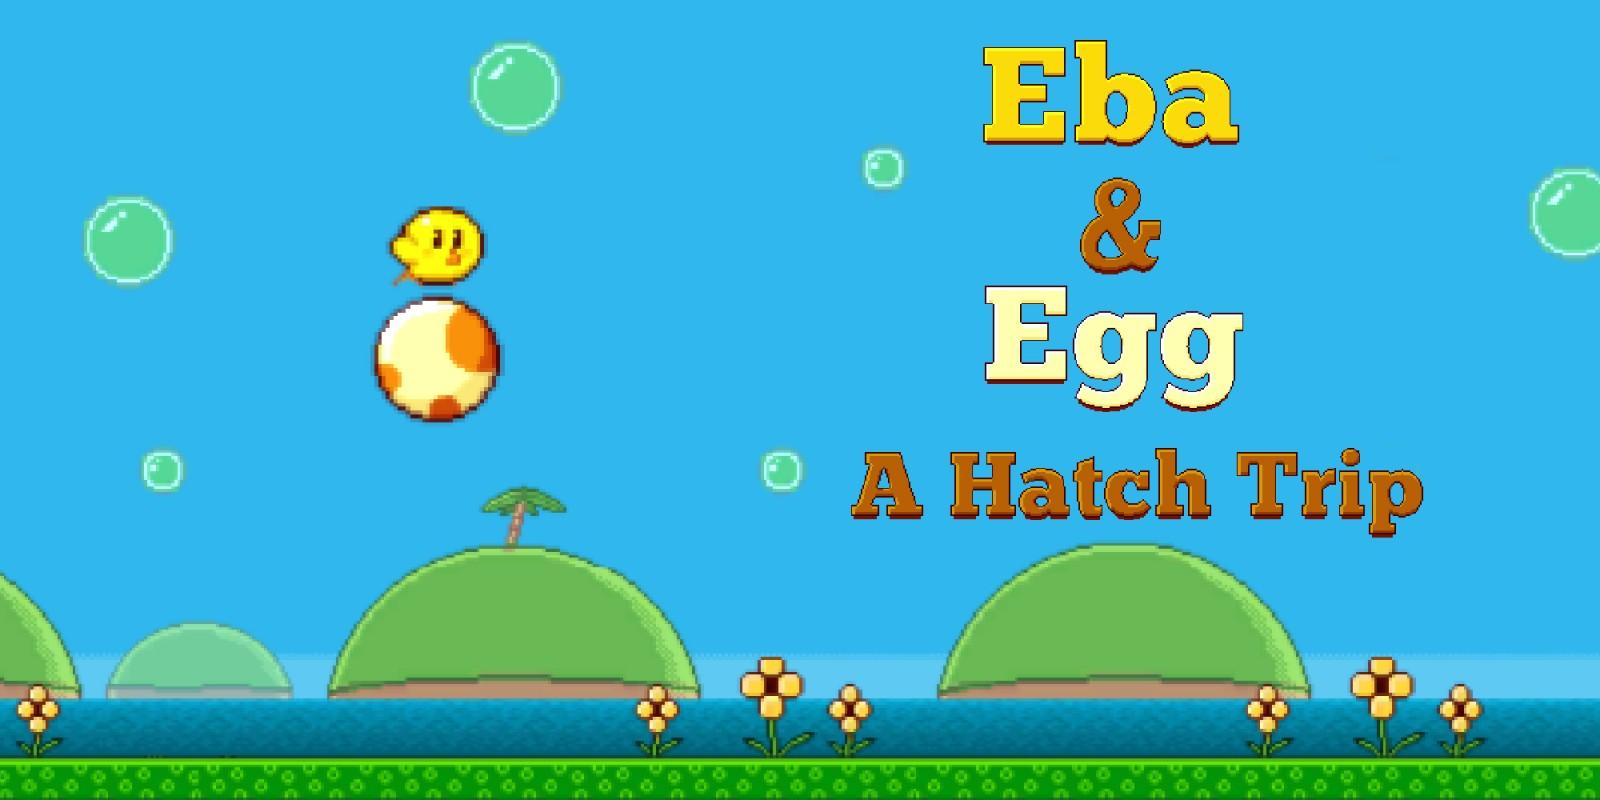 EBA: Eba & Egg: A Hatch Trip